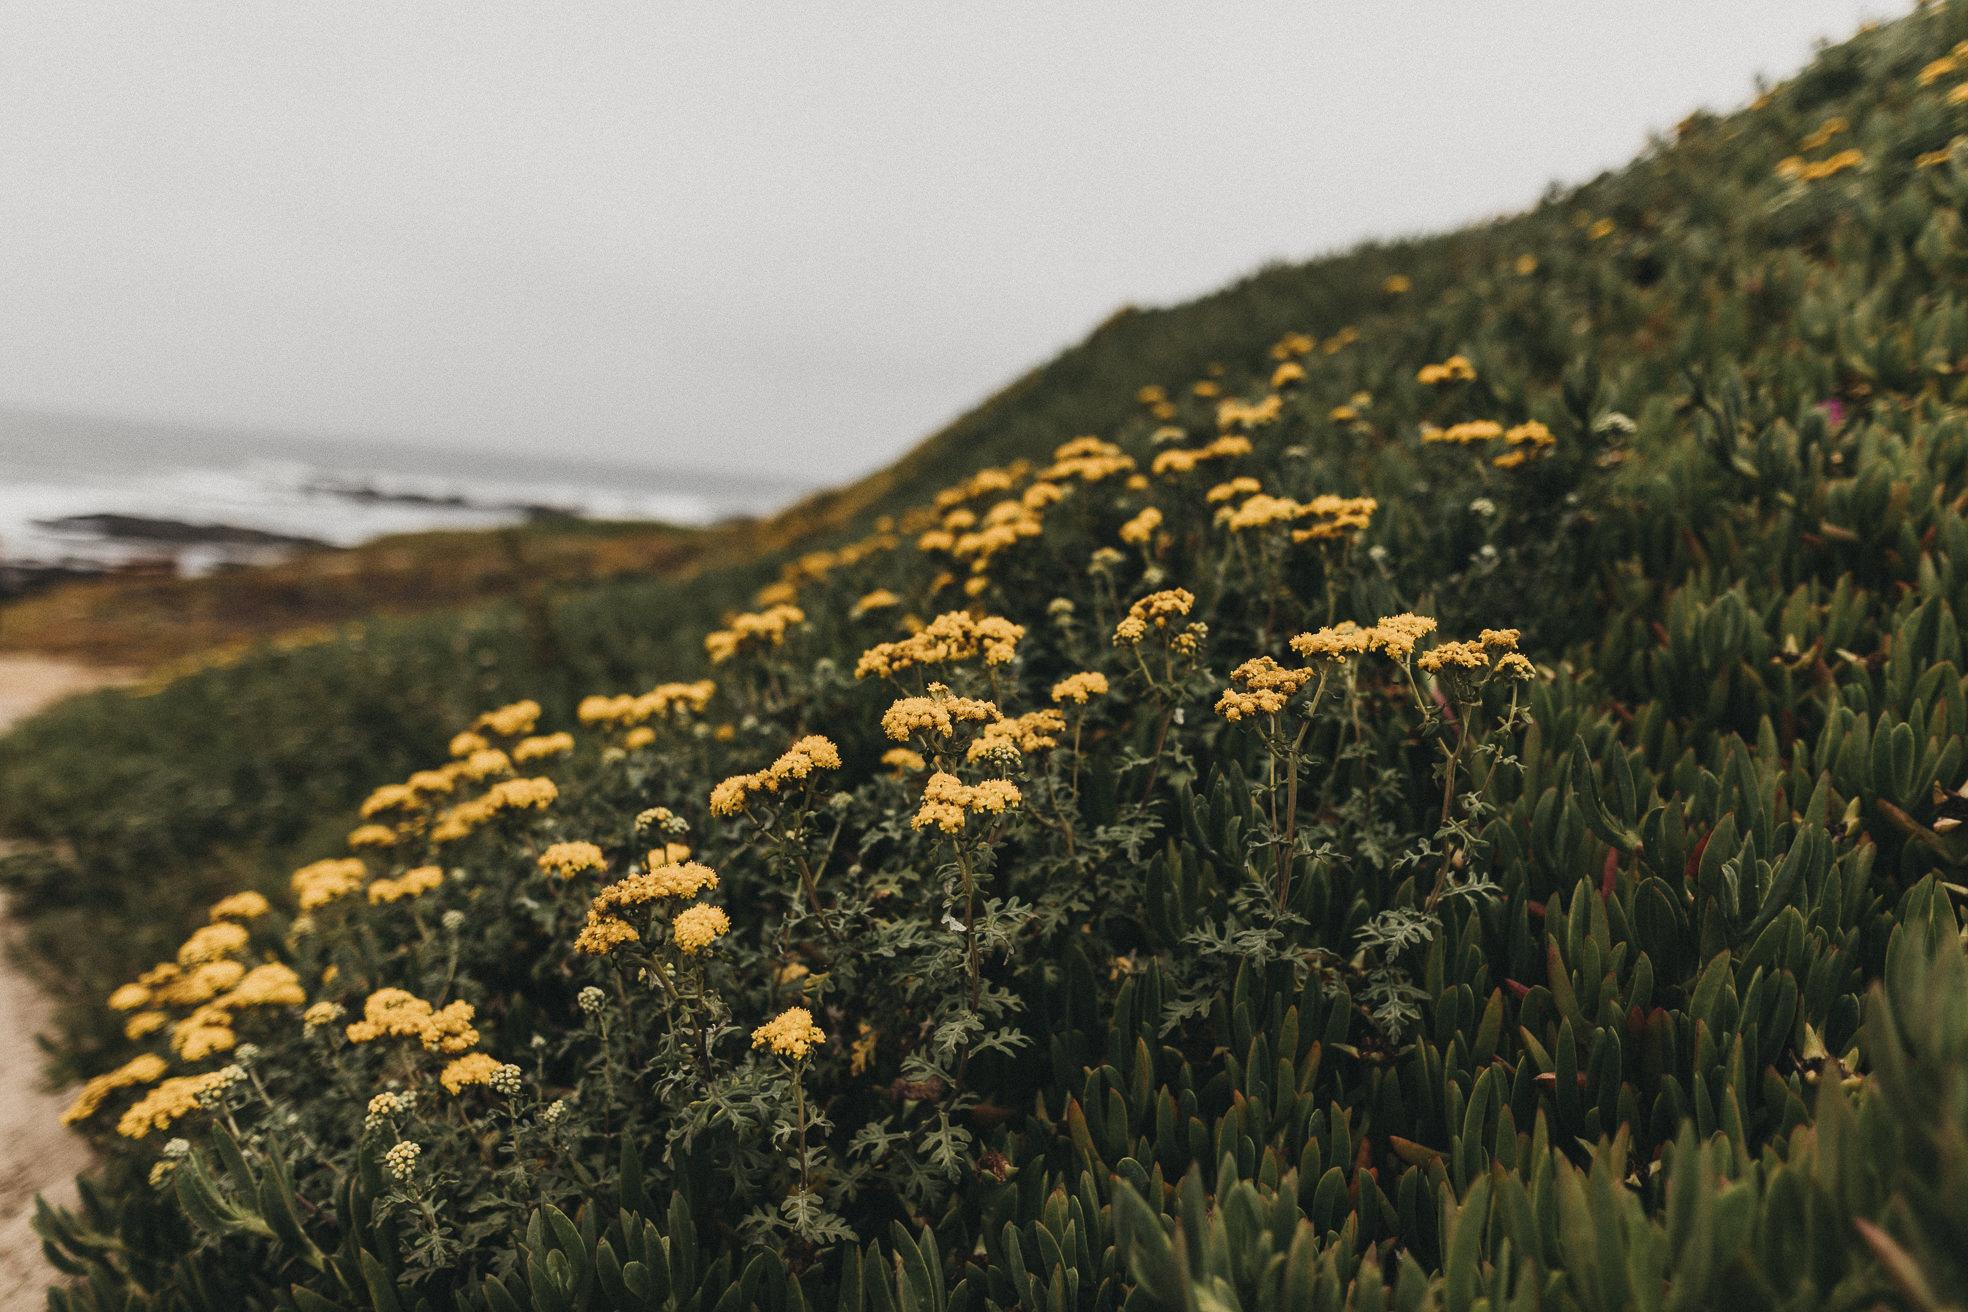 San-Francisco-BildervomLeben-9910